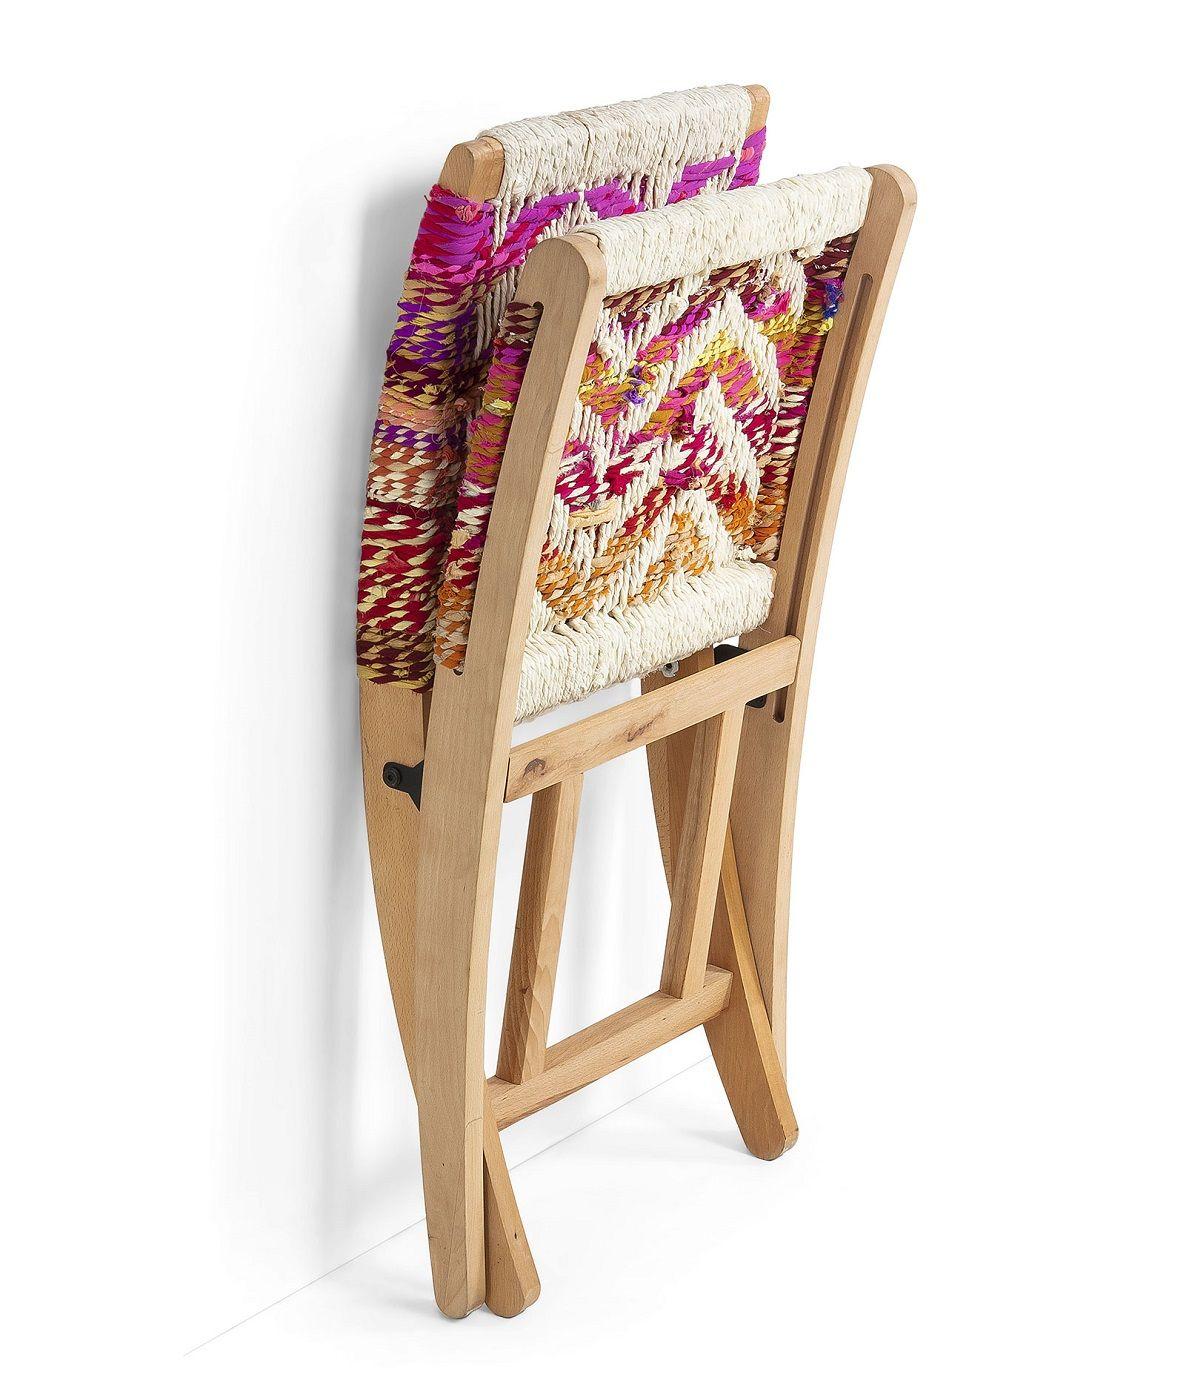 LaForma Heane Foldestol mangotræ - Flettet garn